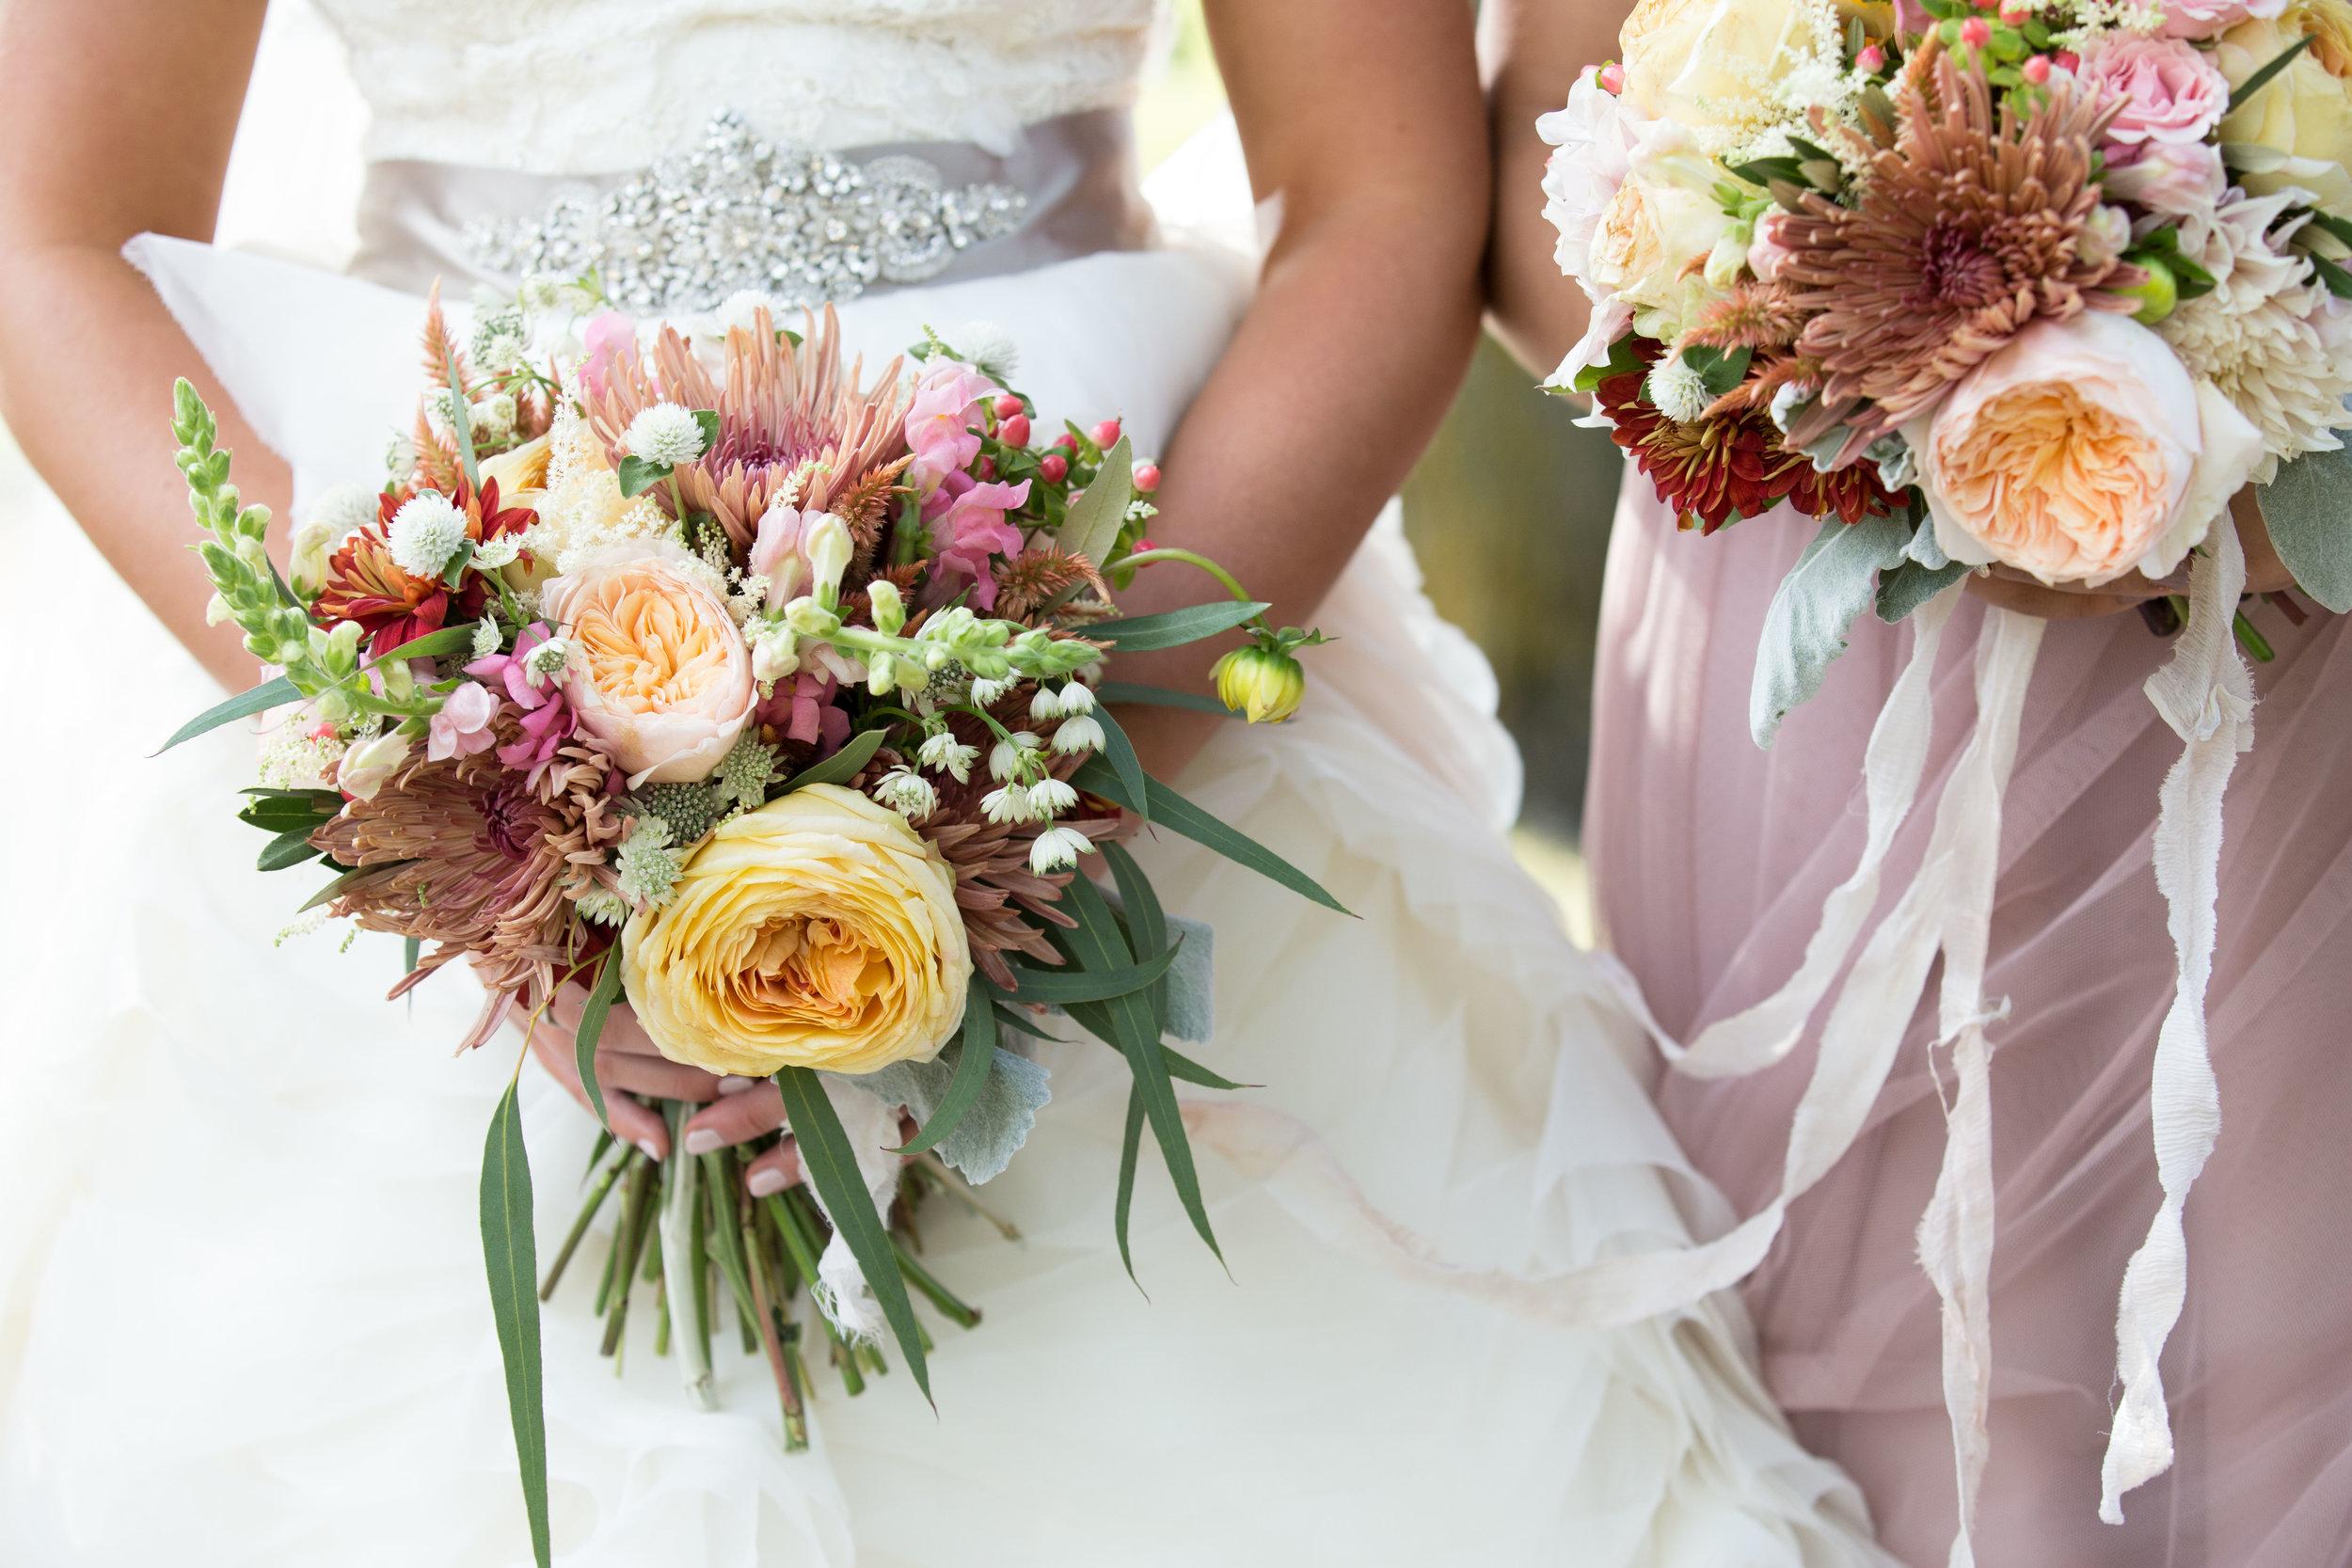 Philadelphia-Wedding-Planner-Heart-And-Dash-NicoleConnor-DrewNoelPhotography-1596.jpg